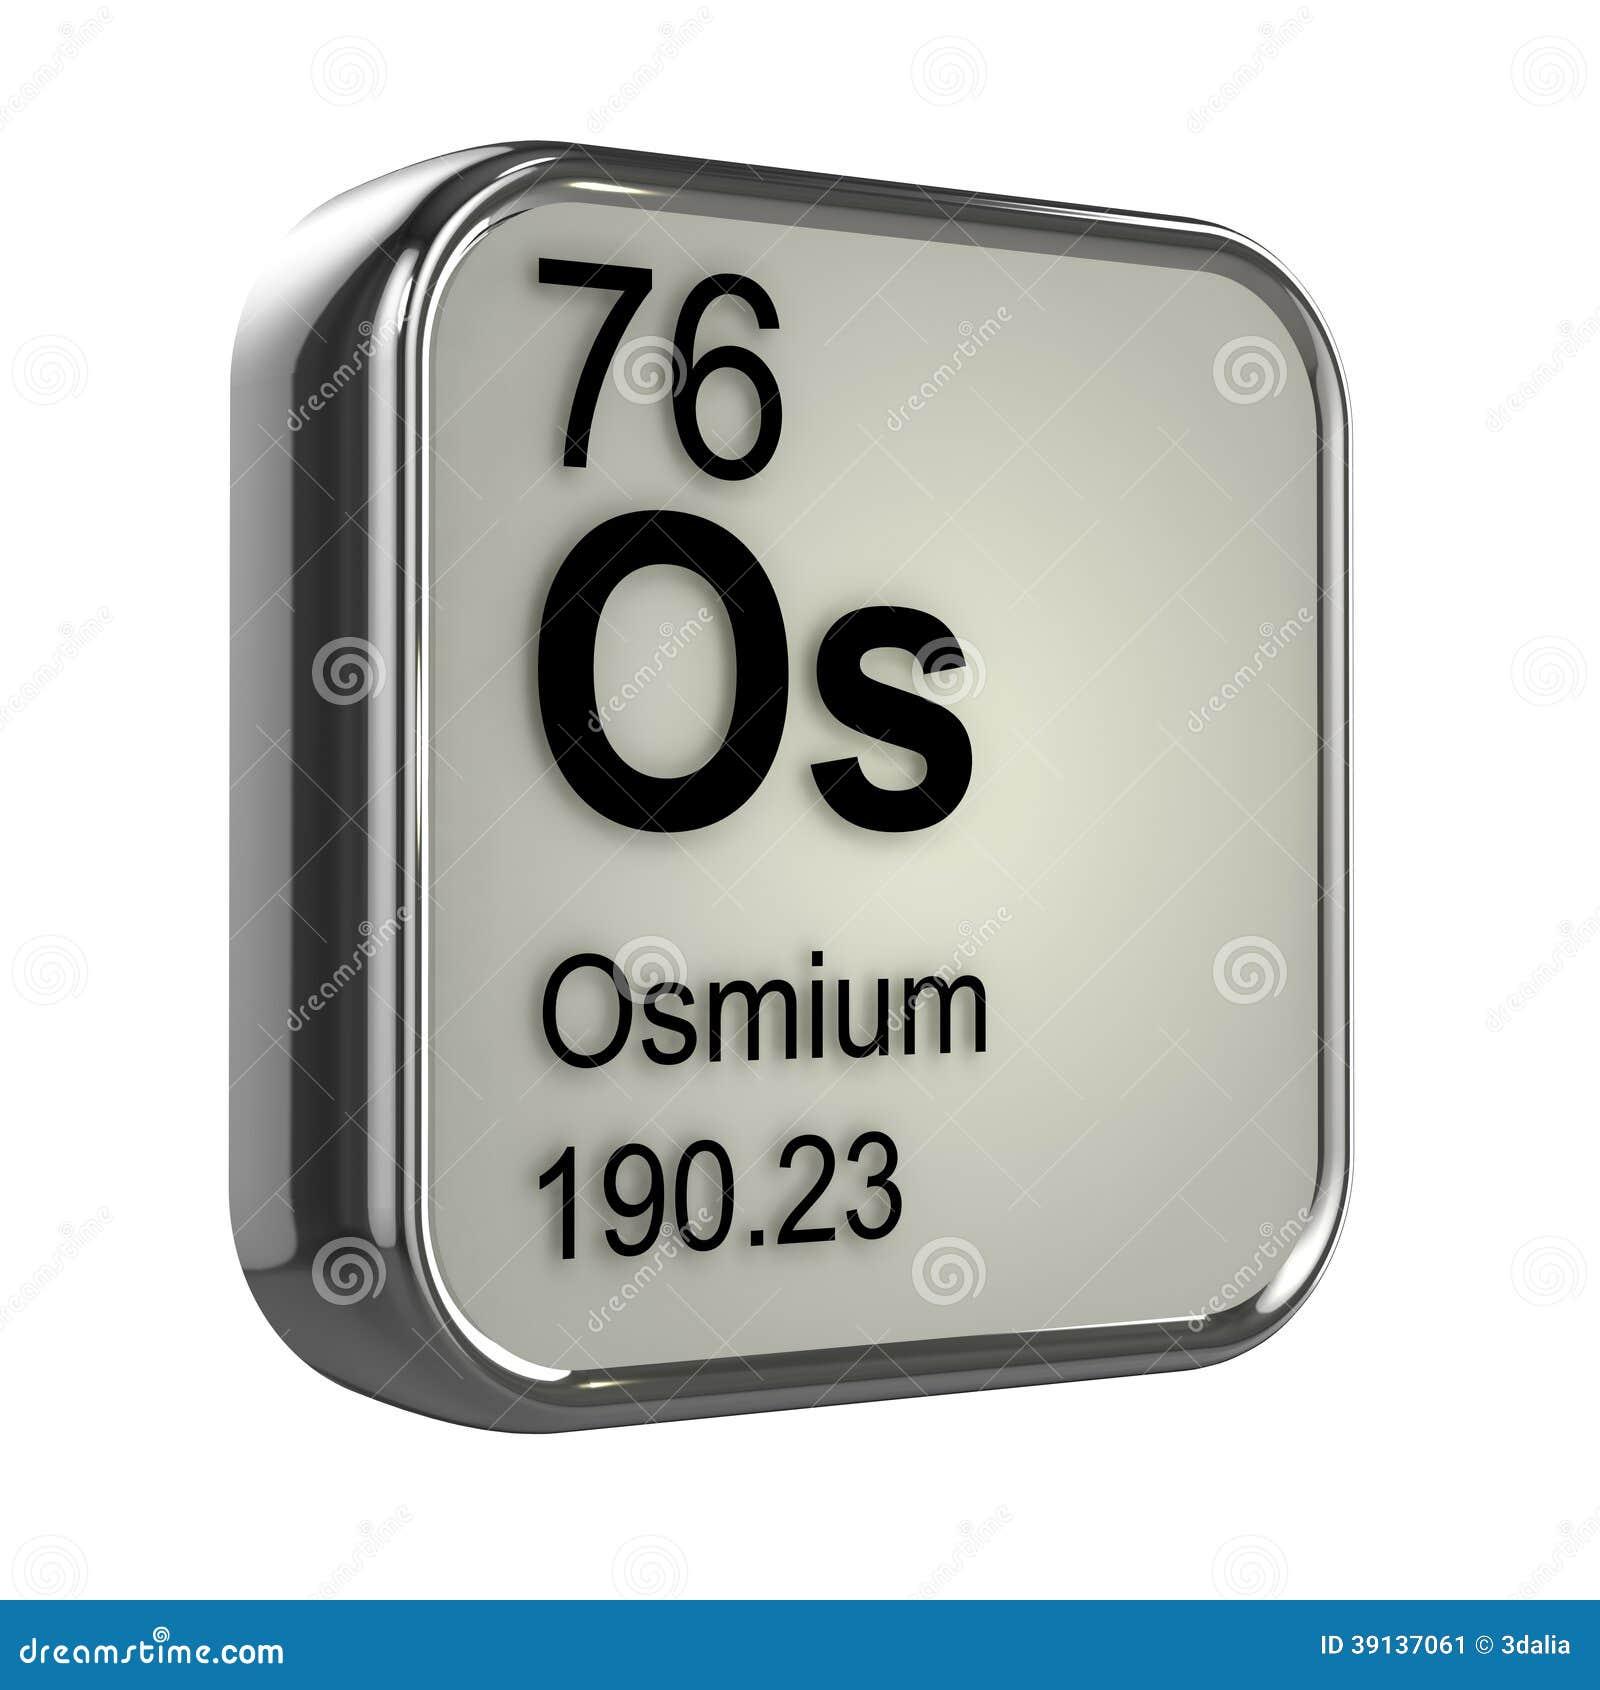 3d osmium element stock illustration illustration of atoms 39137061 royalty free stock photo urtaz Choice Image